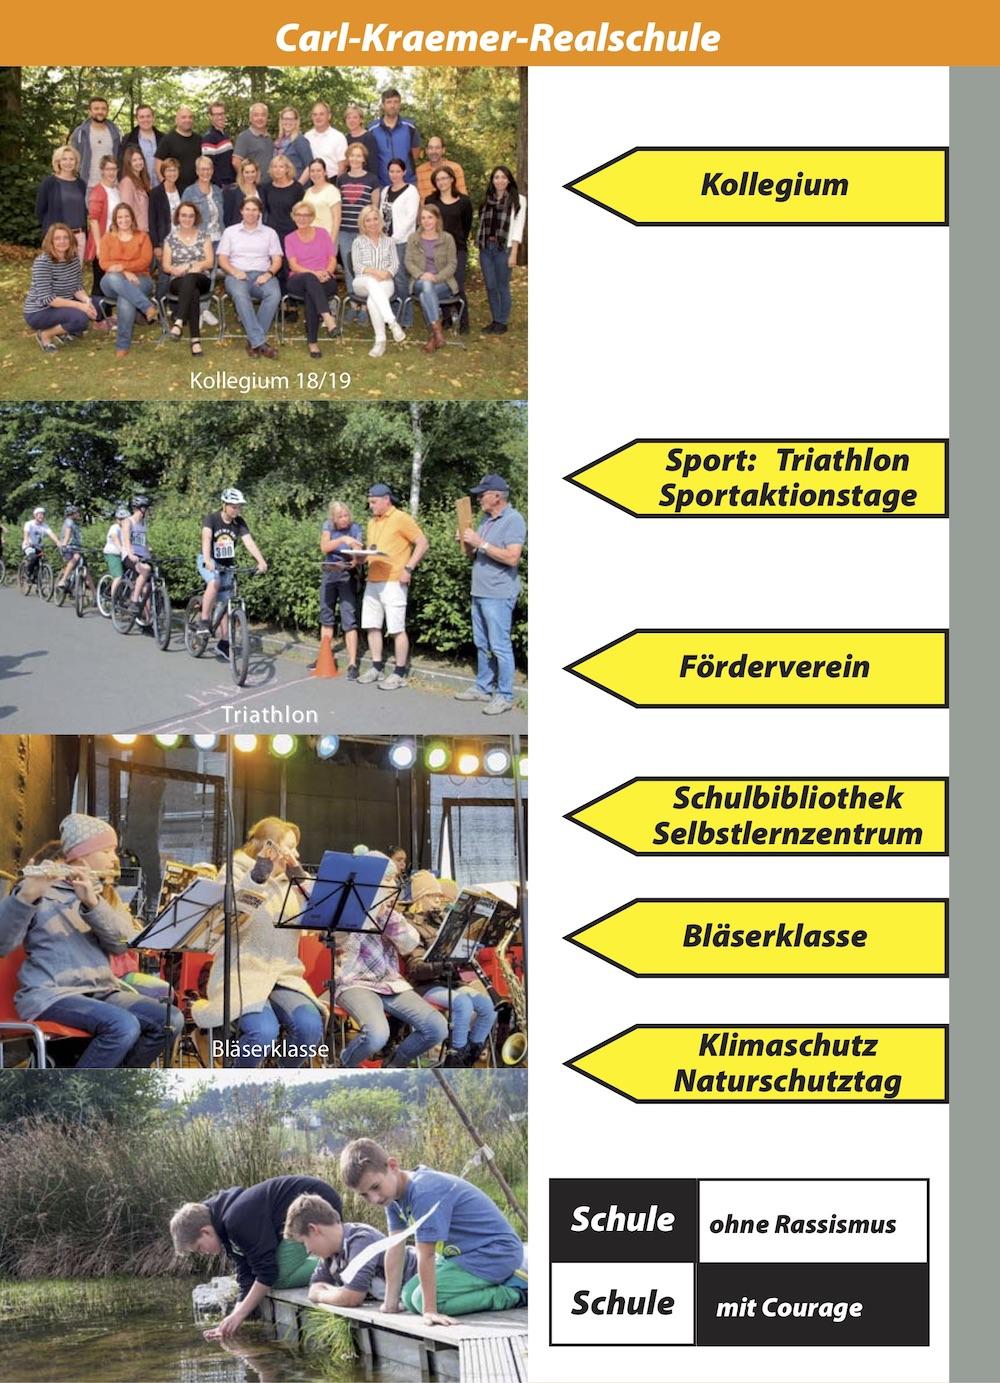 ckr_uebersicht2.jpg